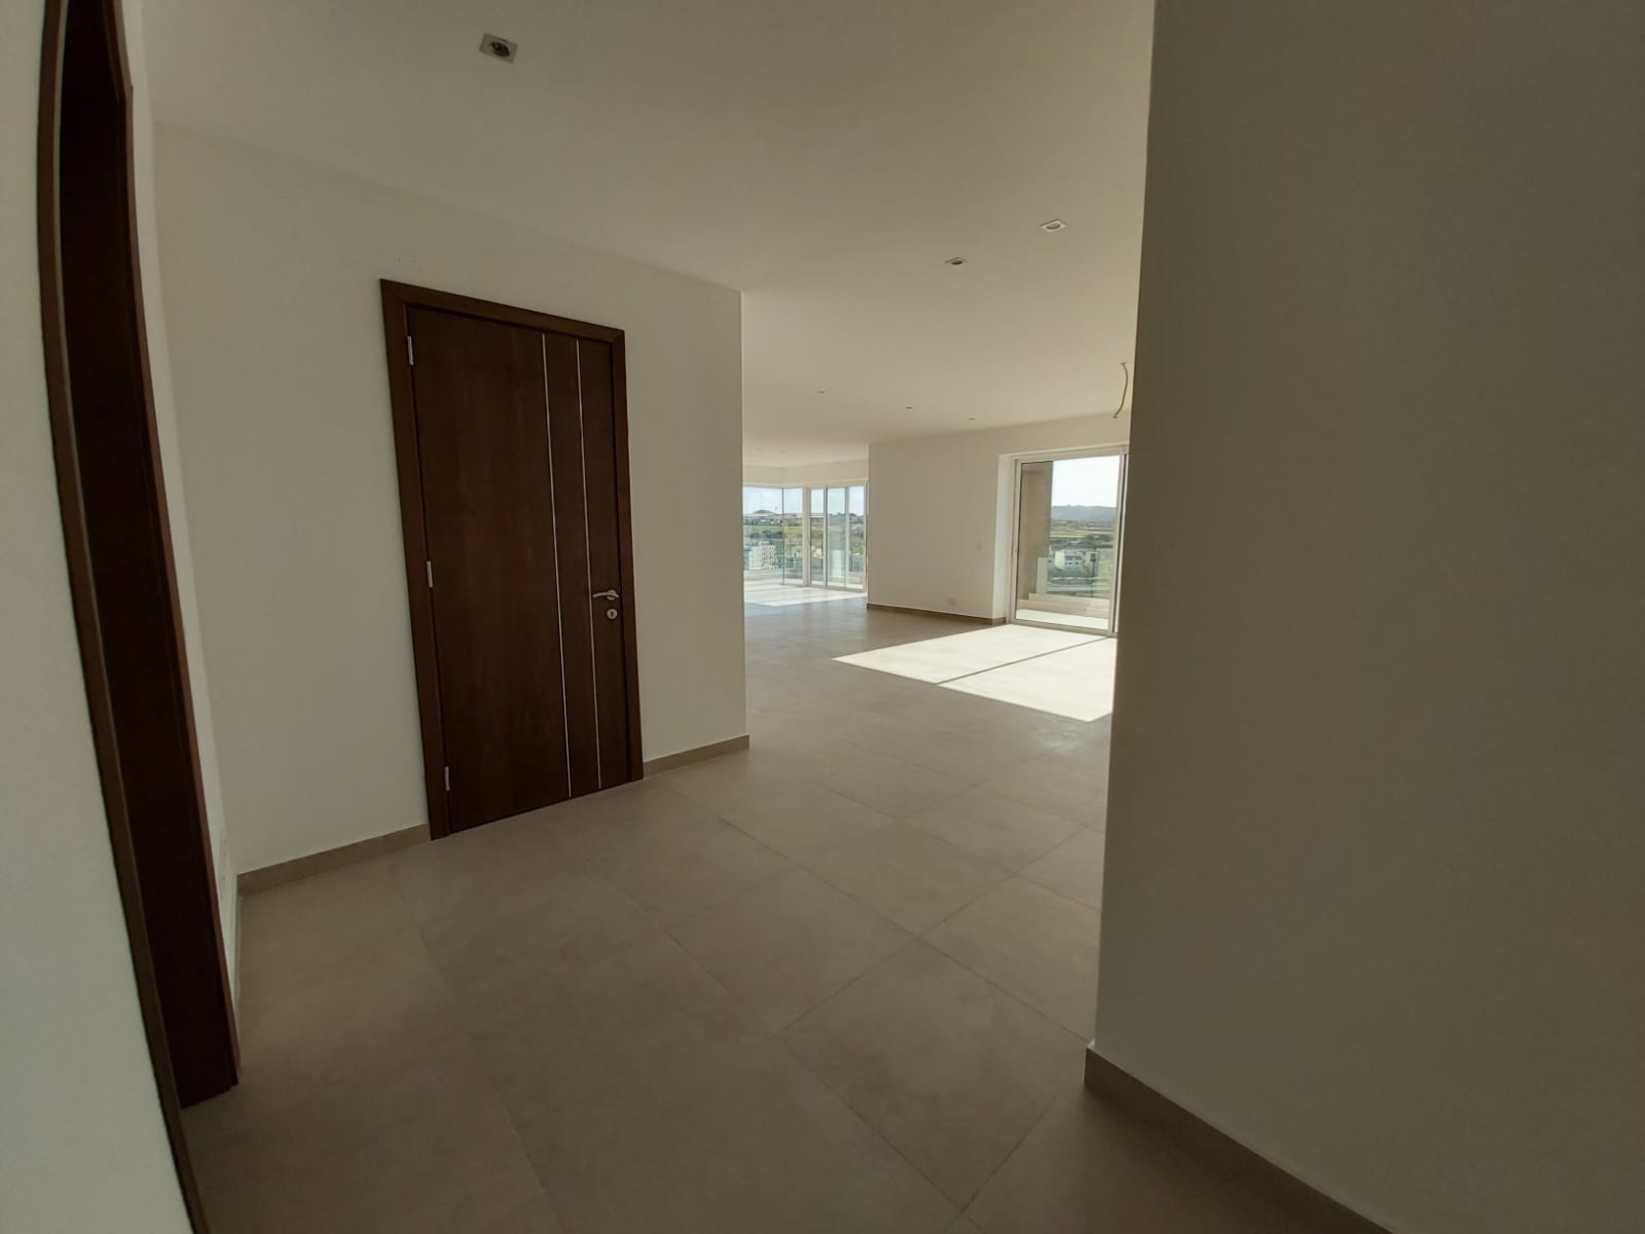 3 bed Apartment For Sale in Qawra, Qawra - thumb 9